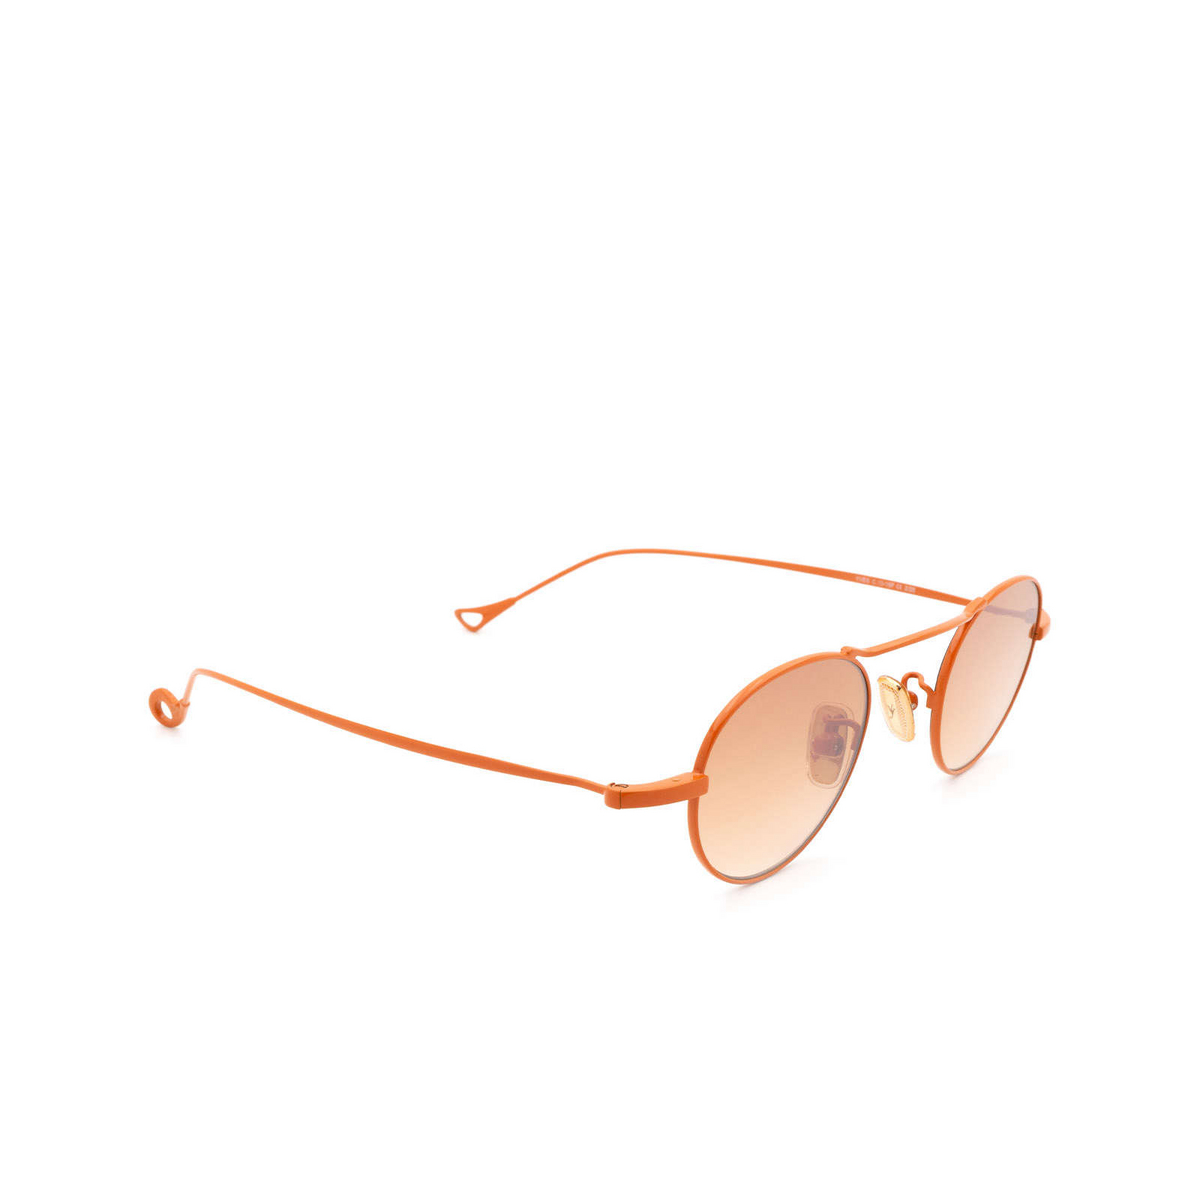 Eyepetizer® Round Sunglasses: Yves color Orange C.13-15F - three-quarters view.